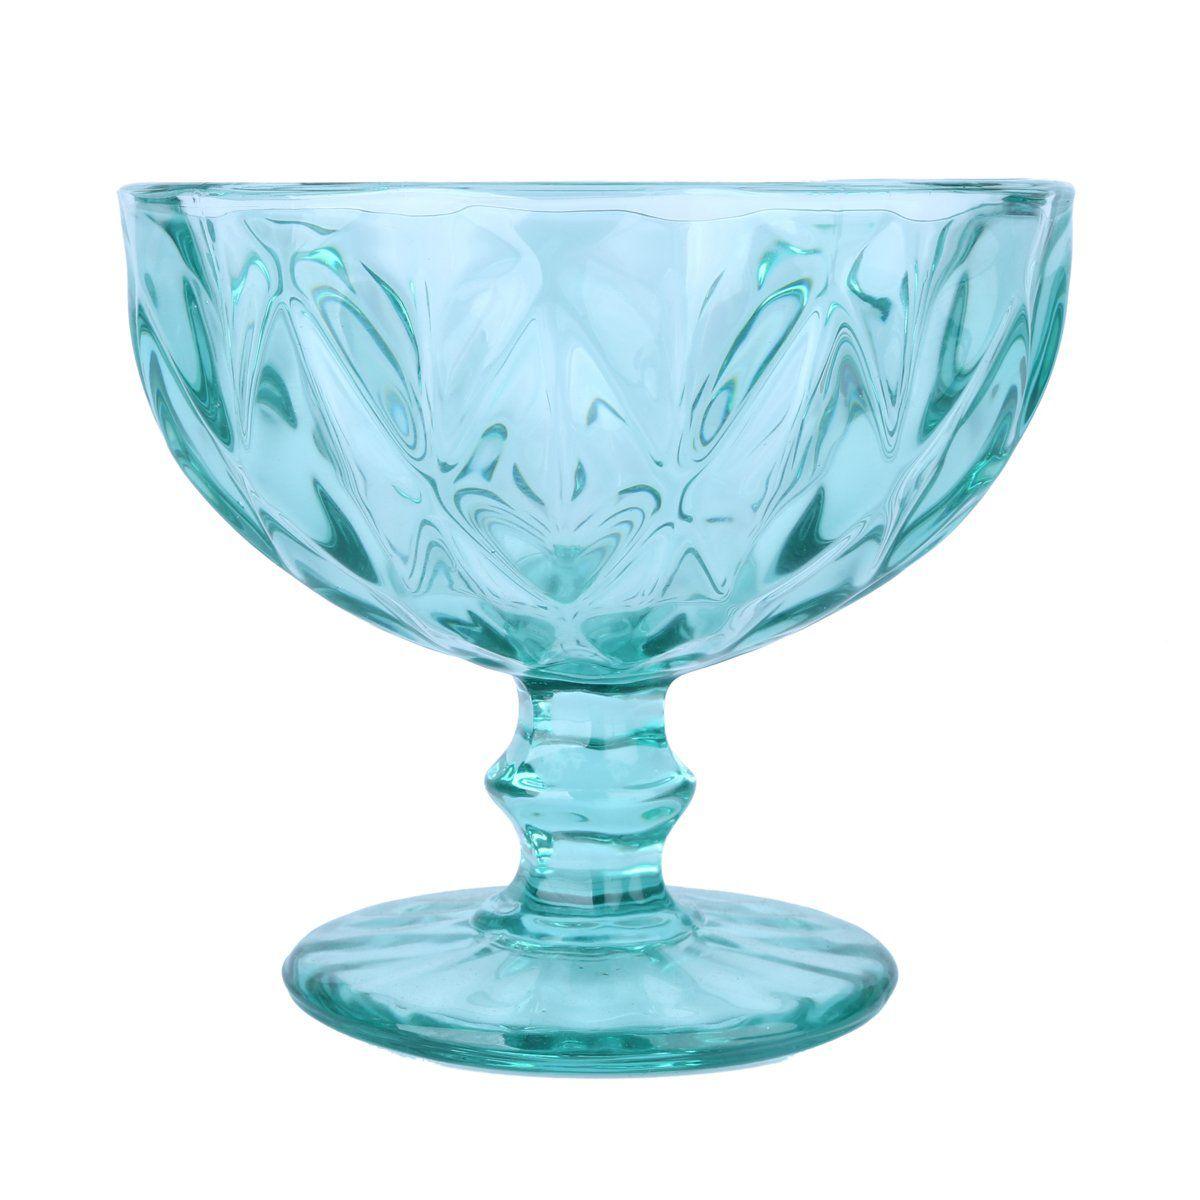 Jogo 6 taças coupe 12 cm para sobremesa de vidro azul tiffany Diamond Lyor - L66936